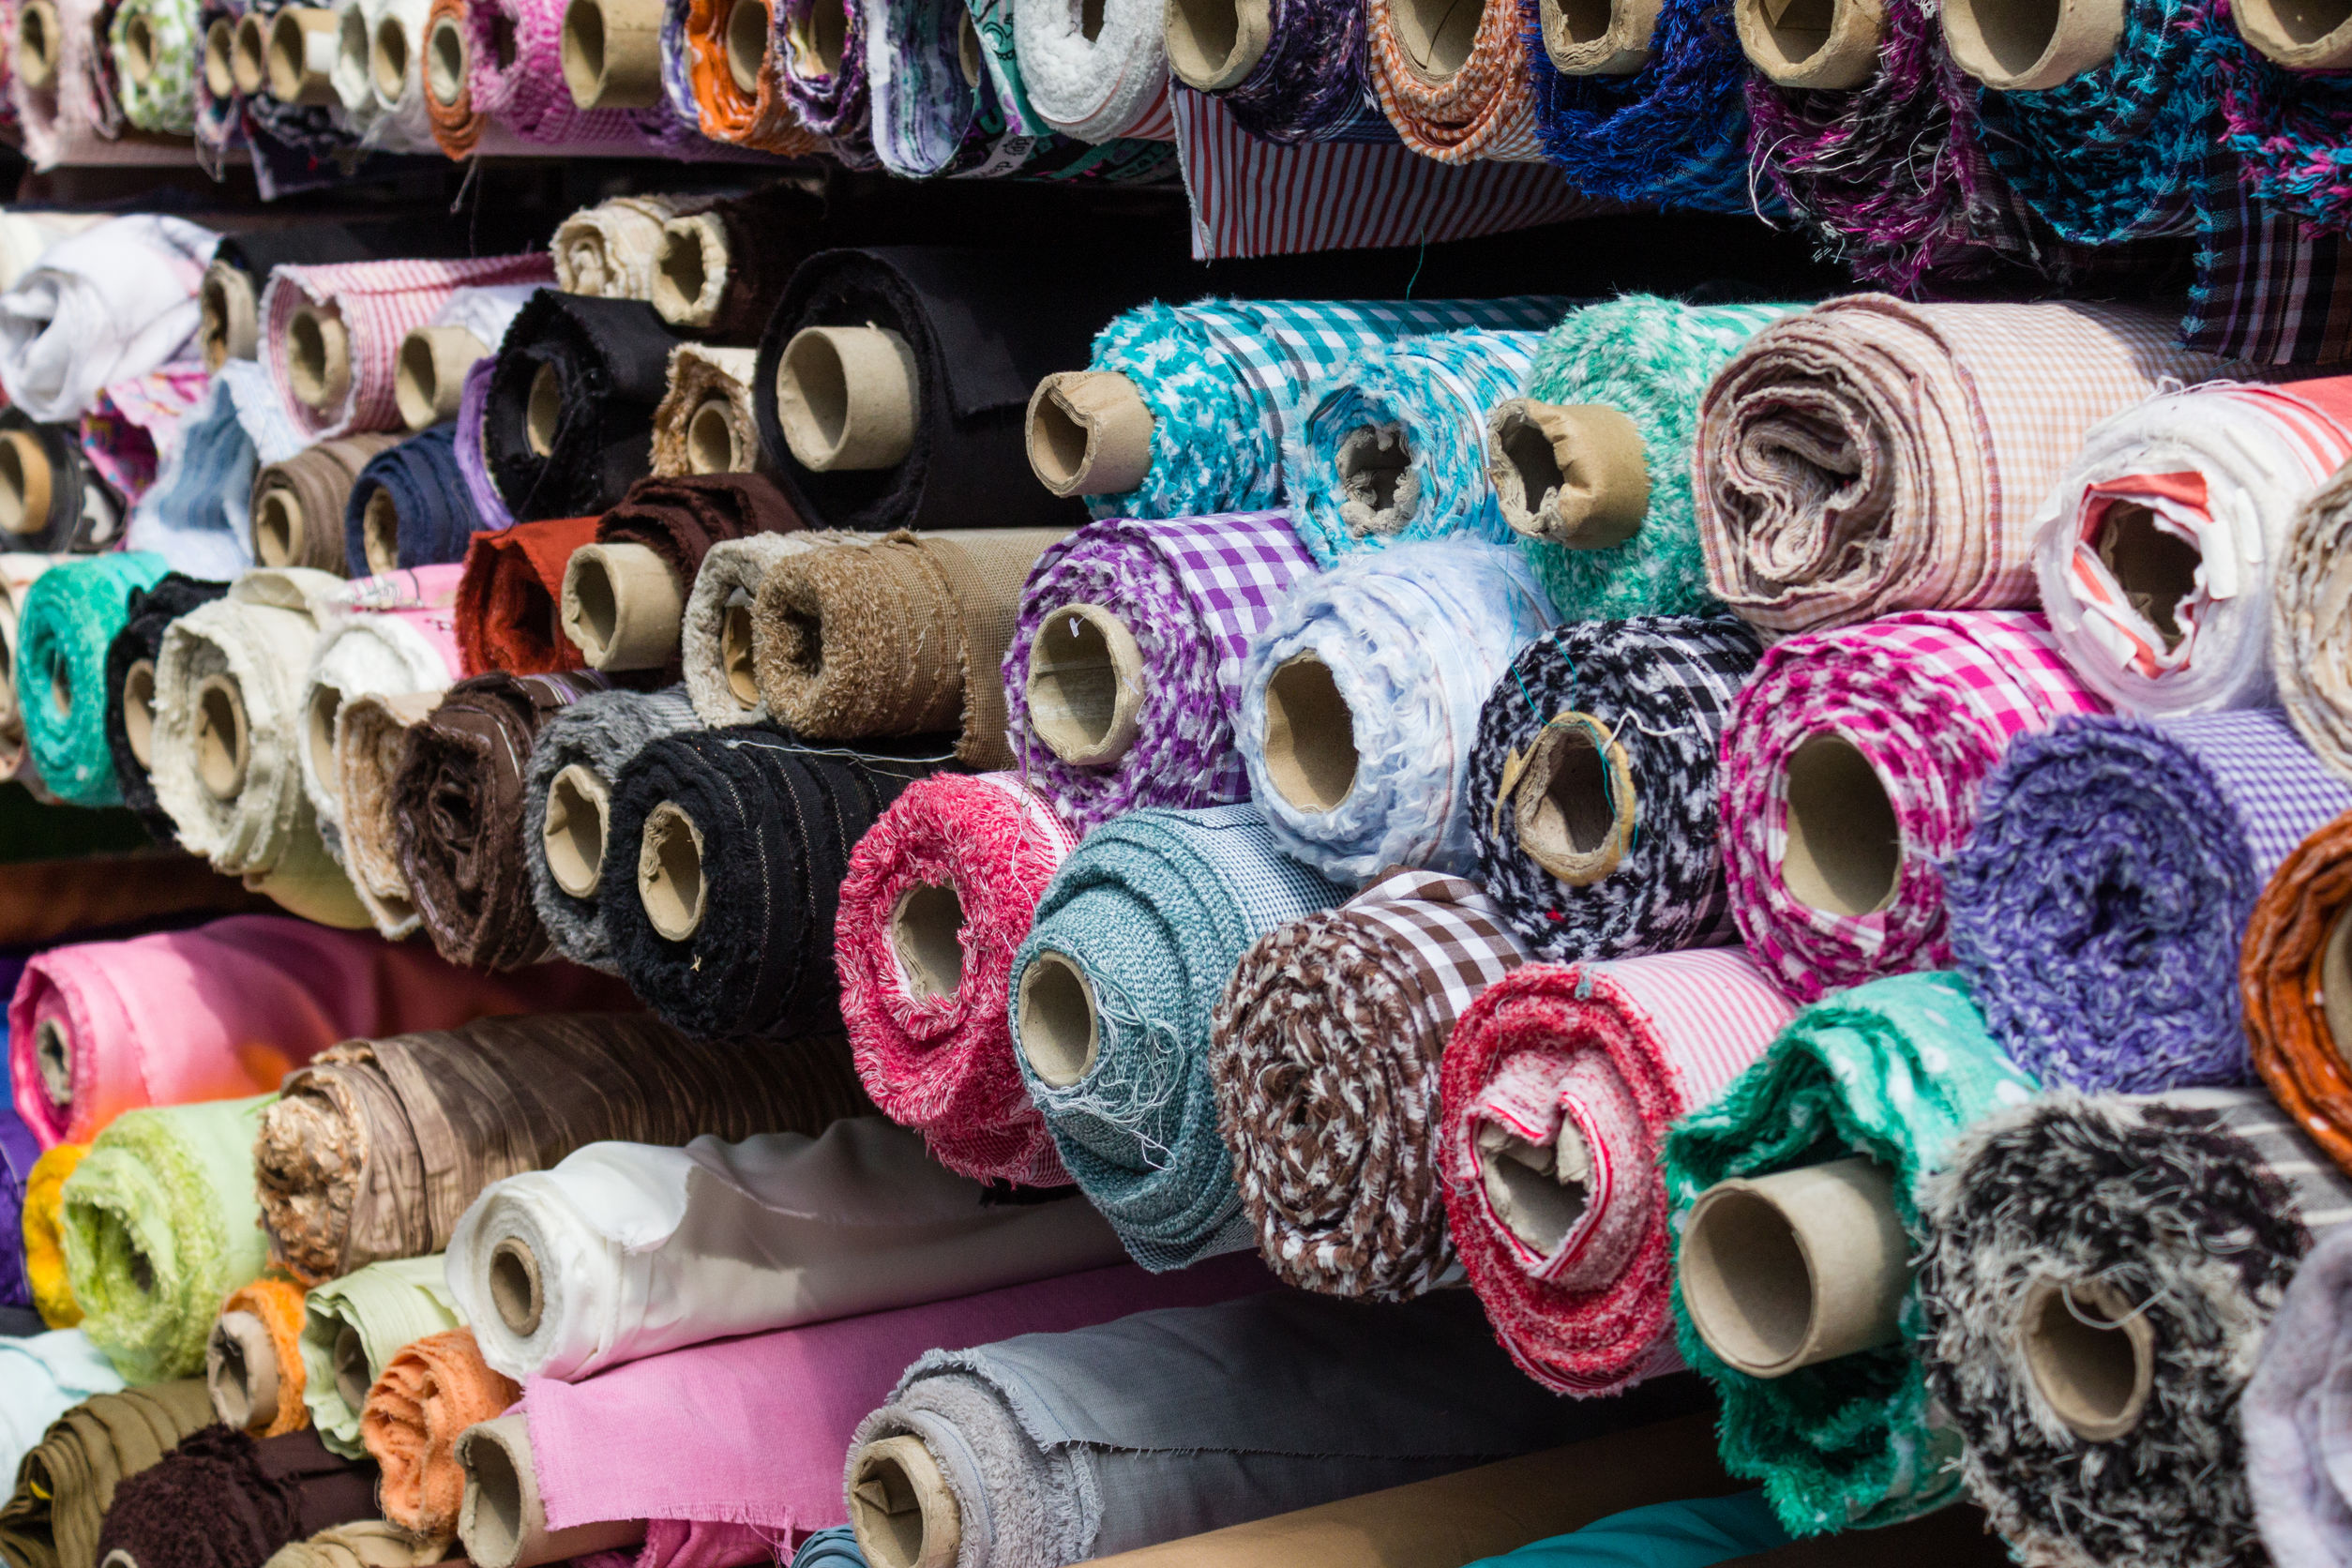 fabric rolls at market stall